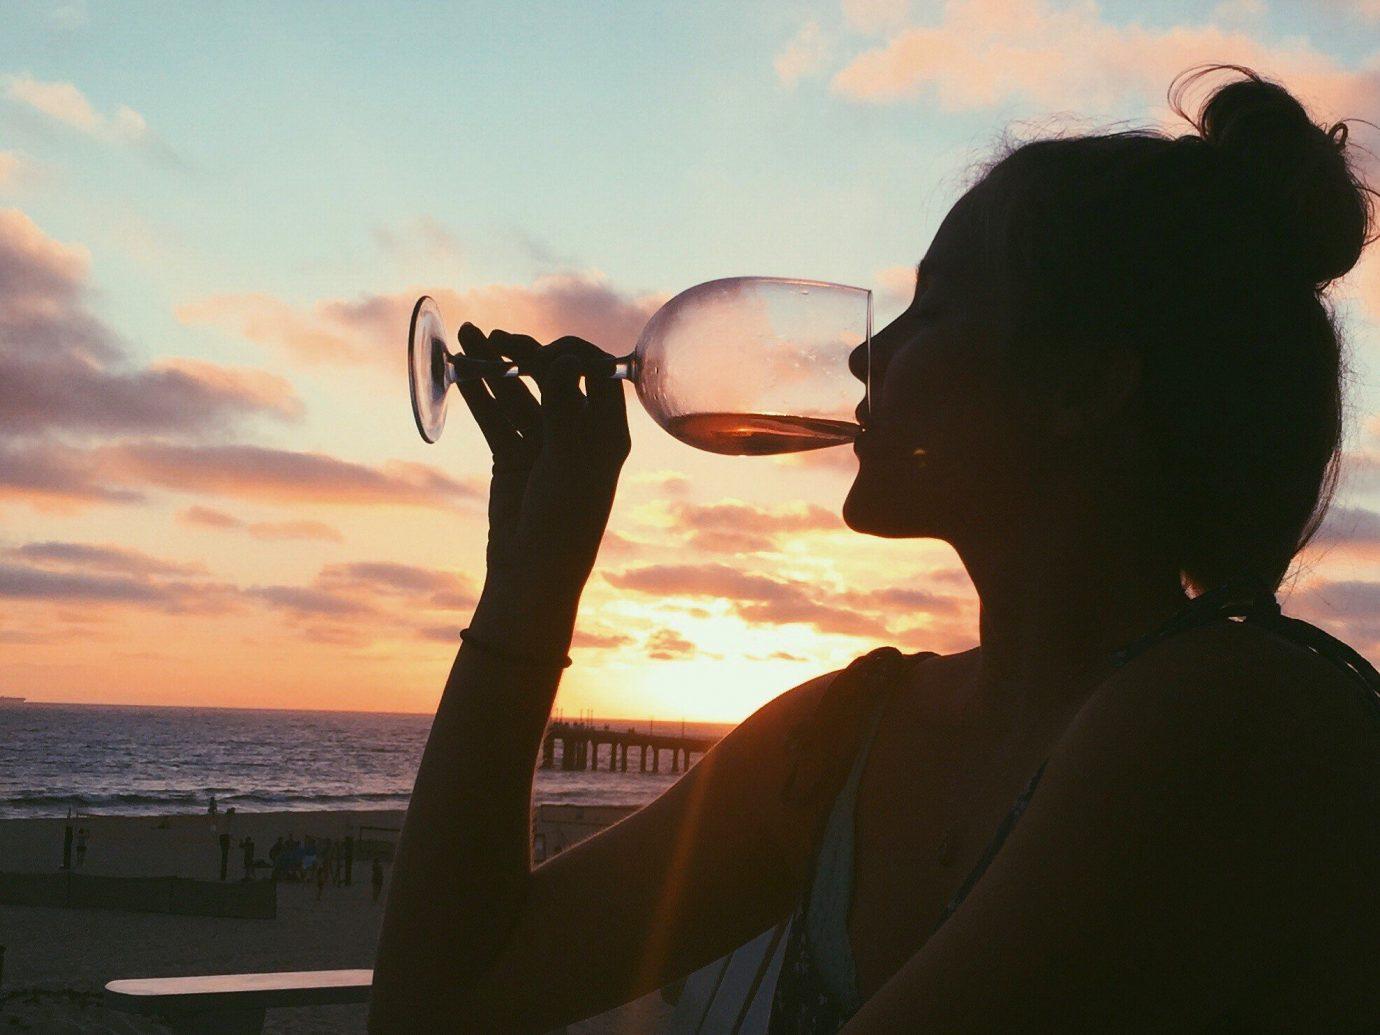 Style + Design person sky Sea sunglasses water vacation glasses cloud photography reflection sunrise horizon vision care Sunset evening eyewear sunlight fun girl summer silhouette calm Beach Sun Ocean backlighting clouds dark